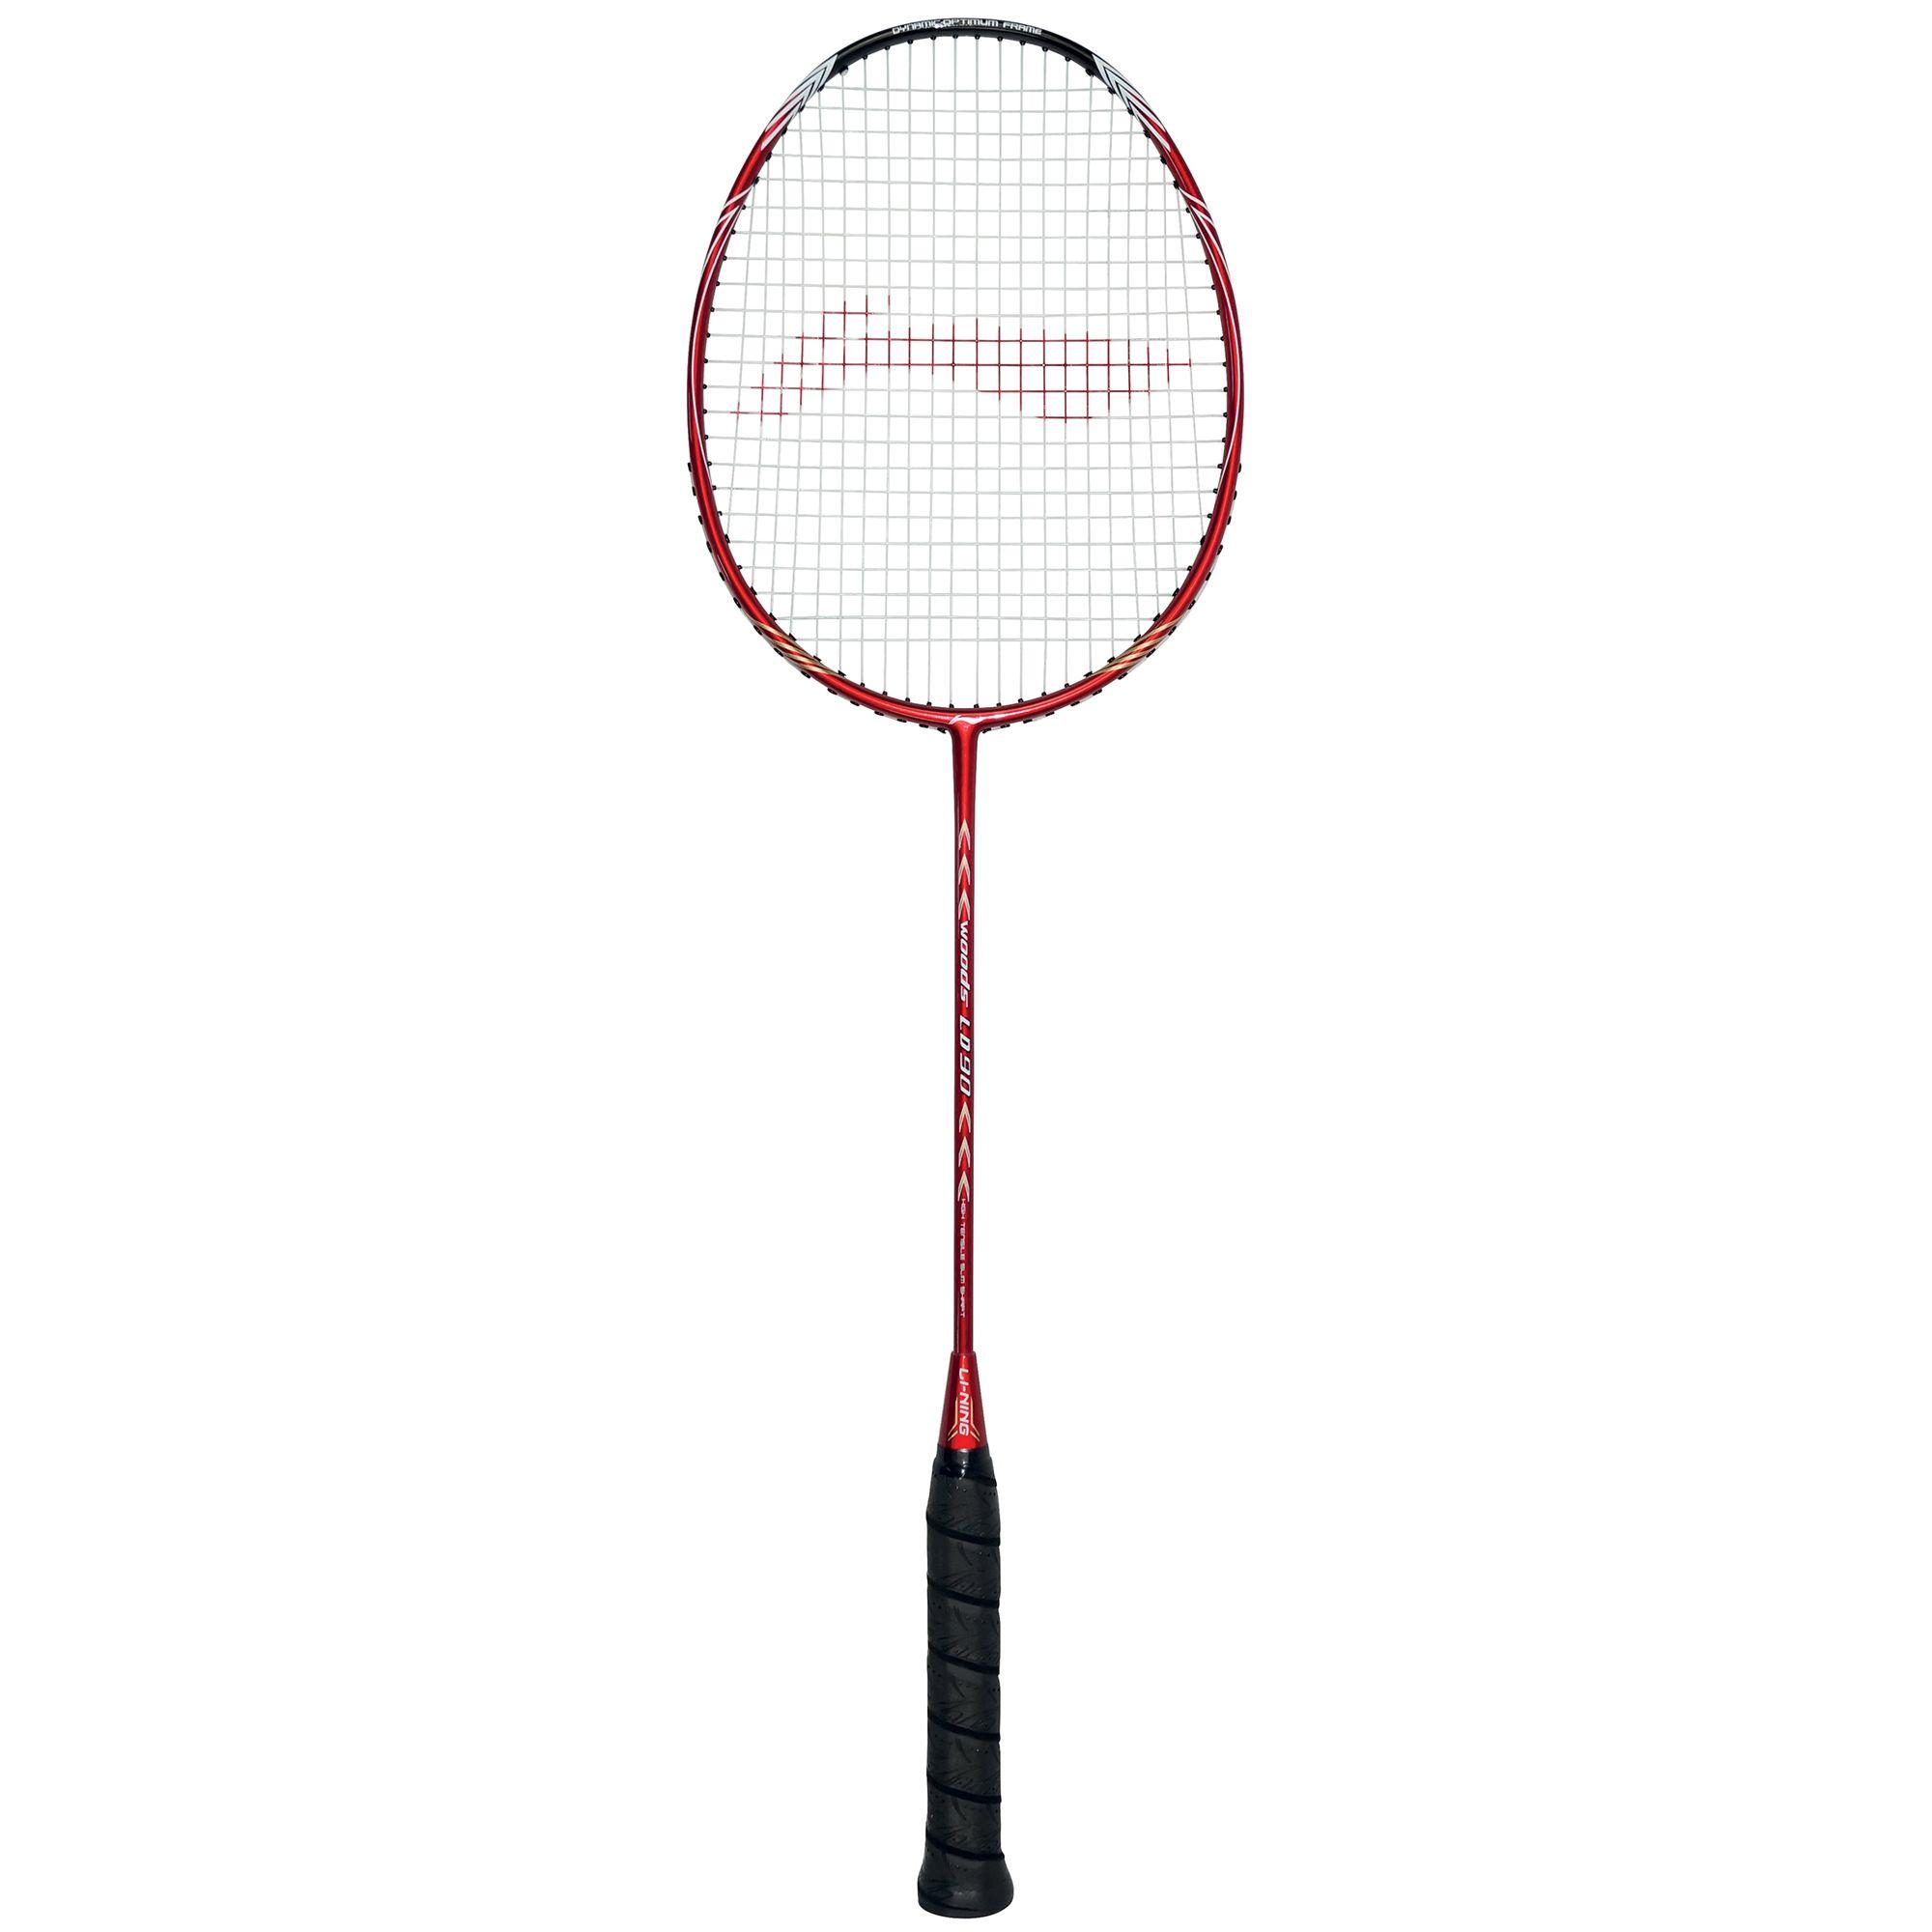 Li-Ning Woods LD 90 Badminton Racket - Sweatband.com